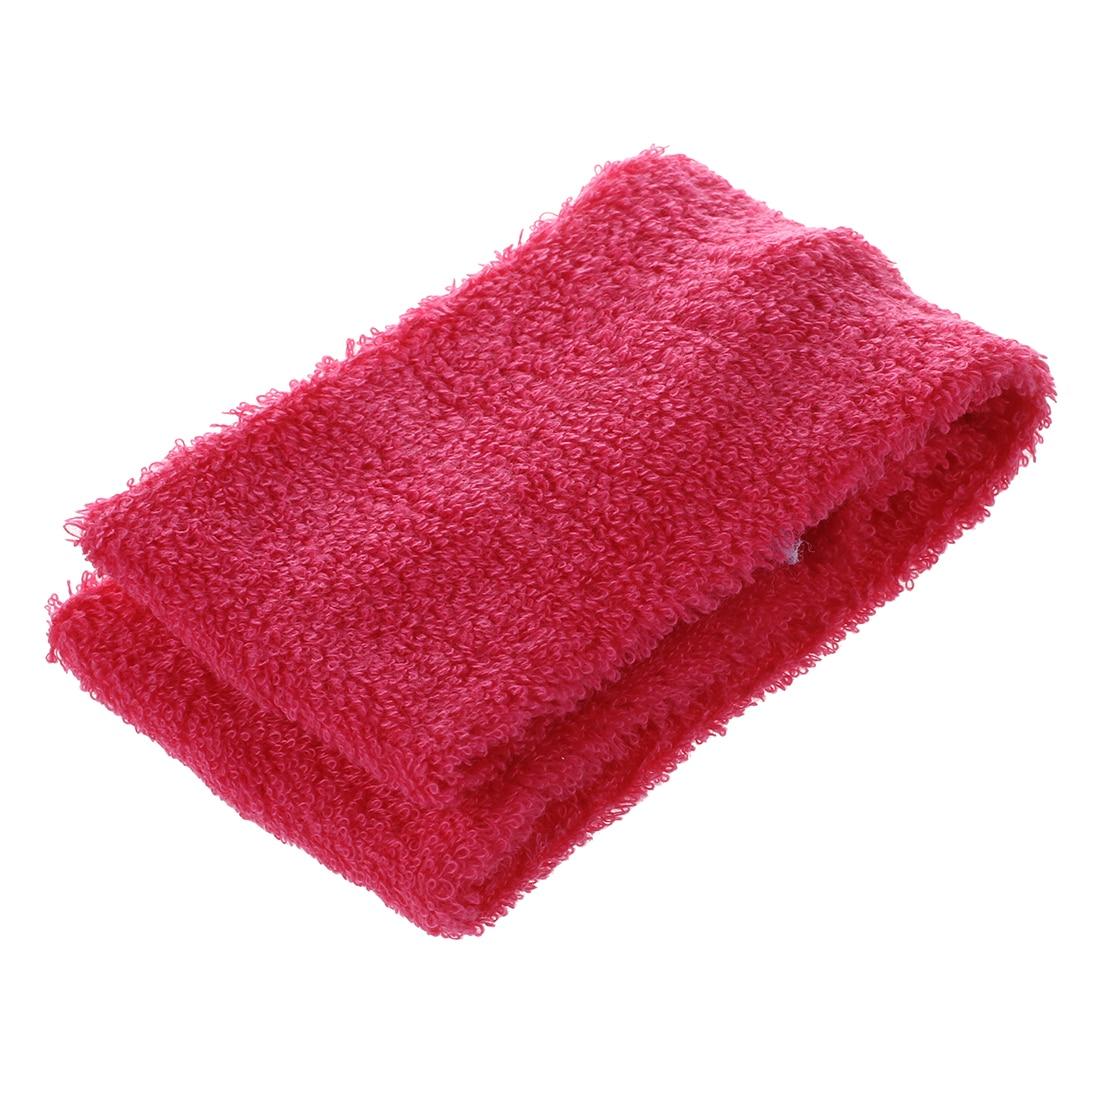 Unisex Women Men Sport Yoga Sweatband Headband Hair Band, Rose Red